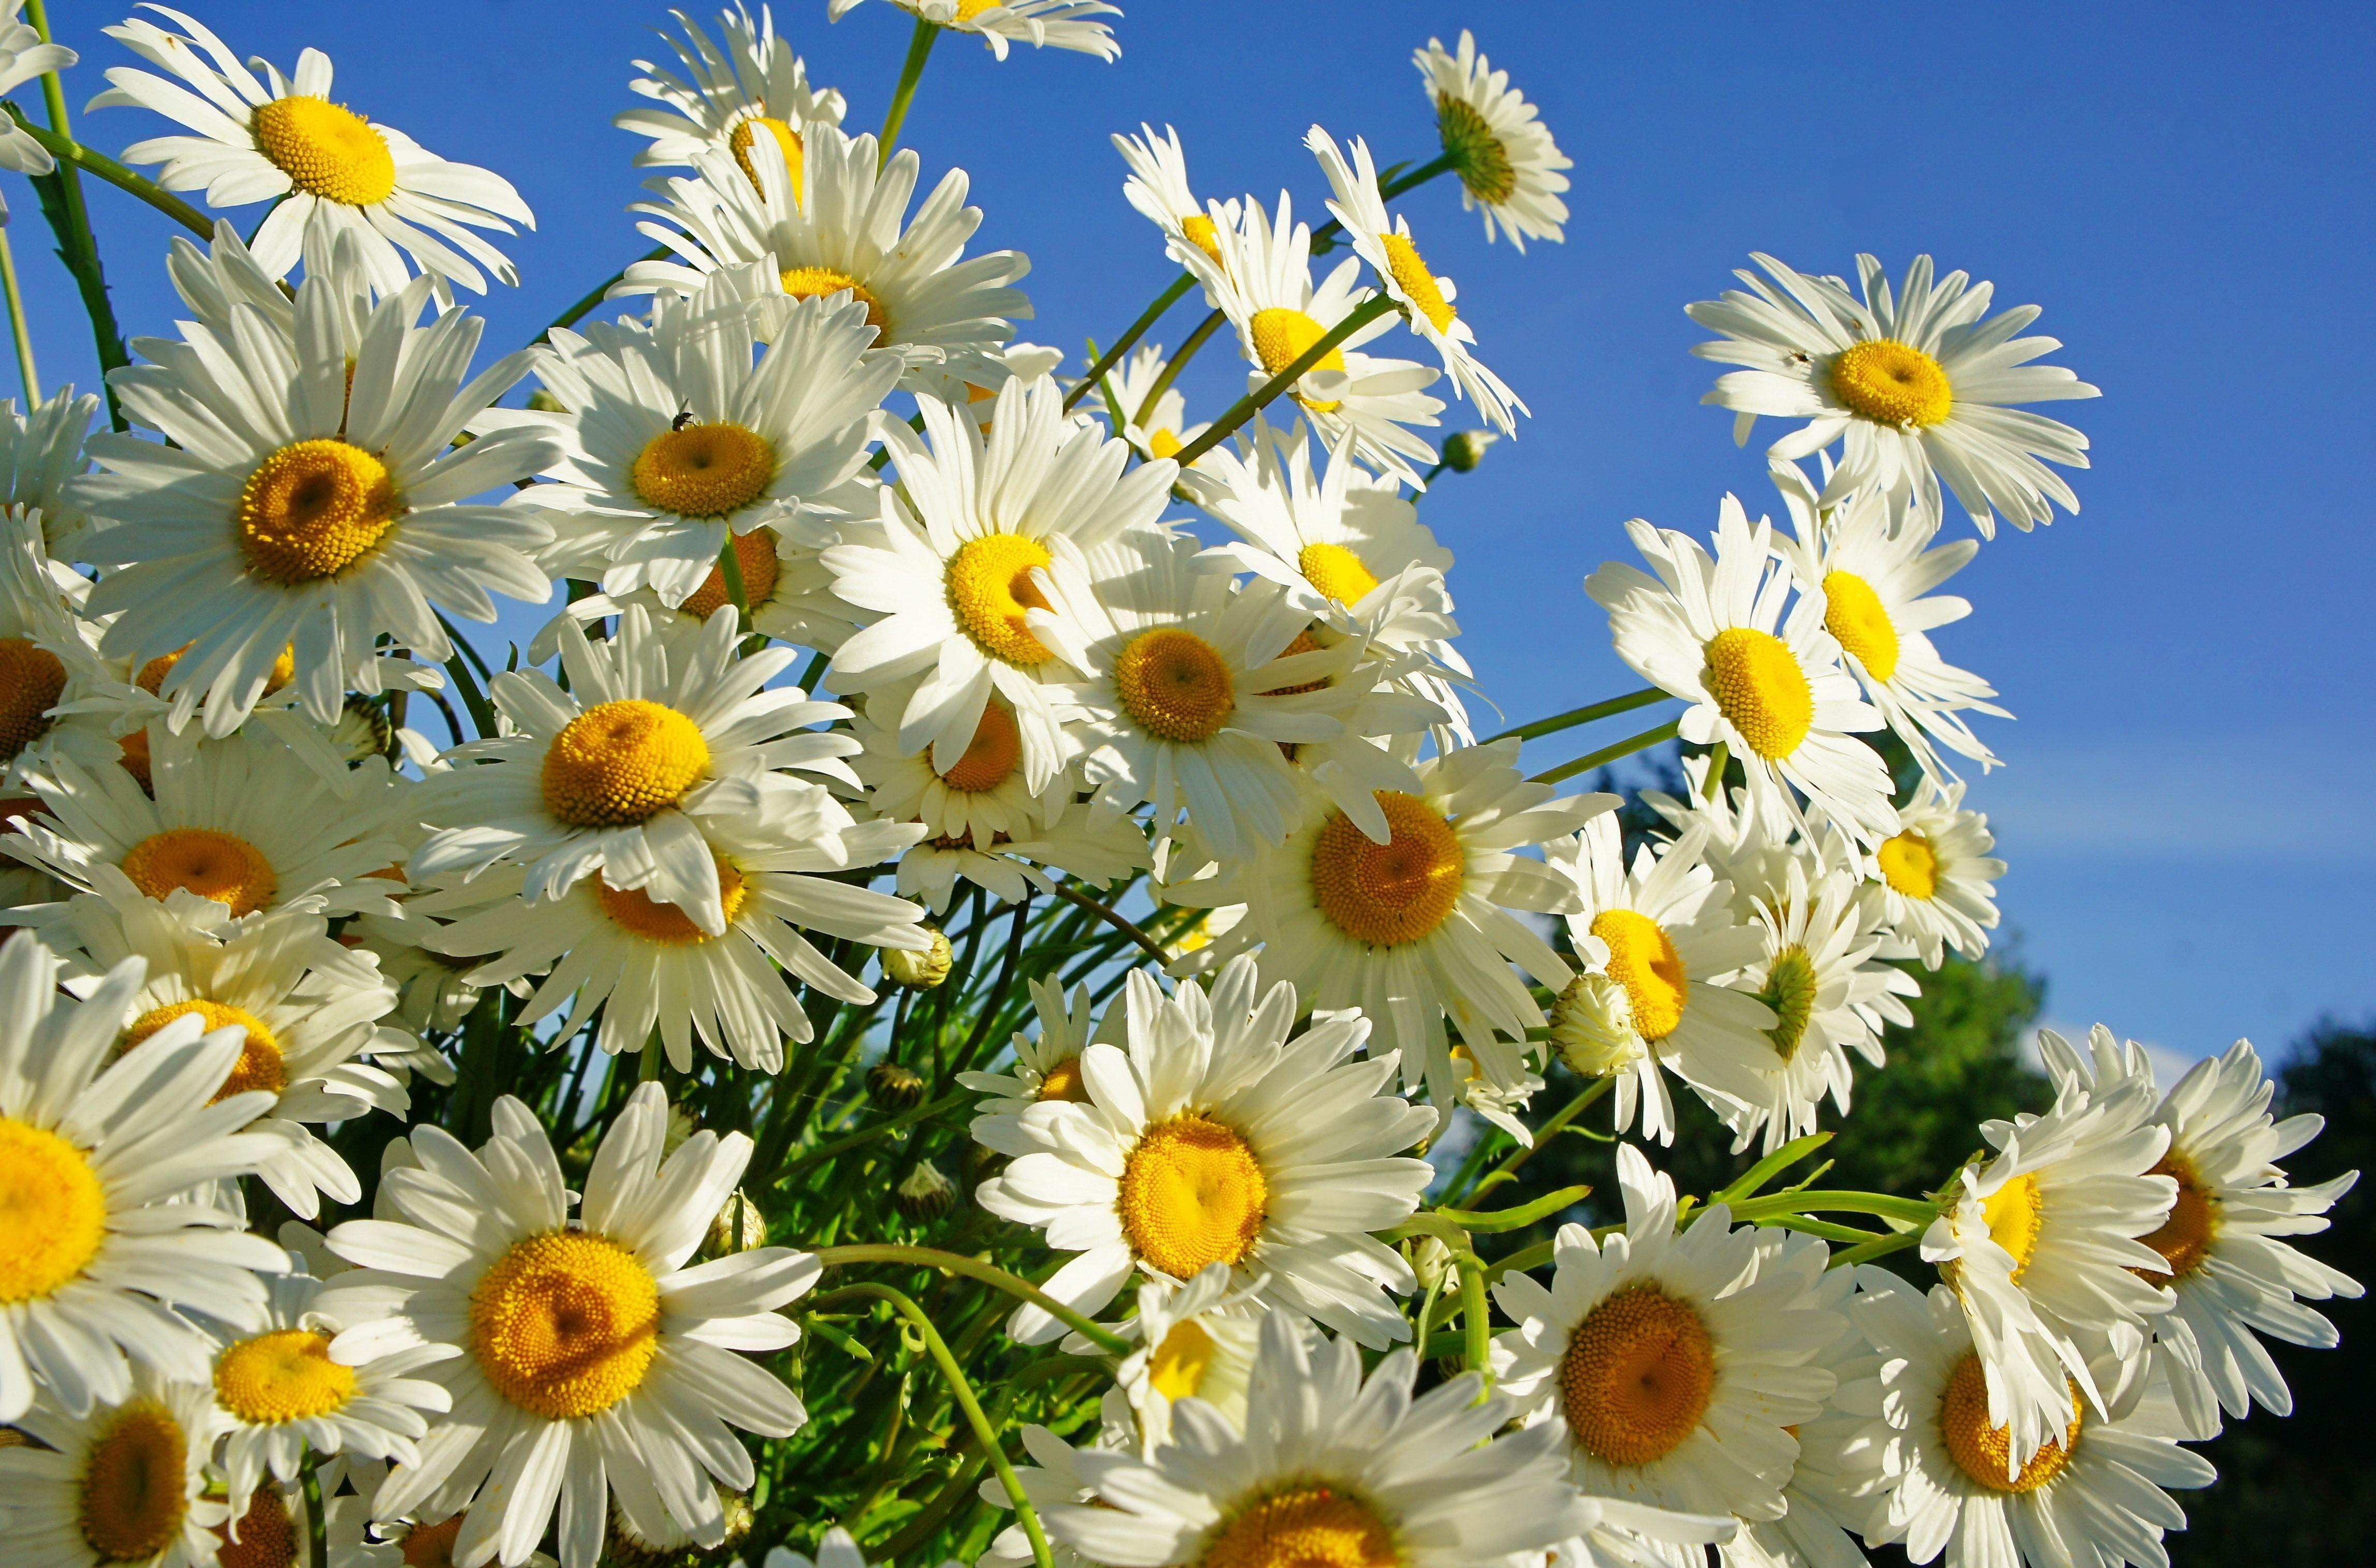 Download Wallpaper Daisies, Flower, Sky, Sunny, Summer HD